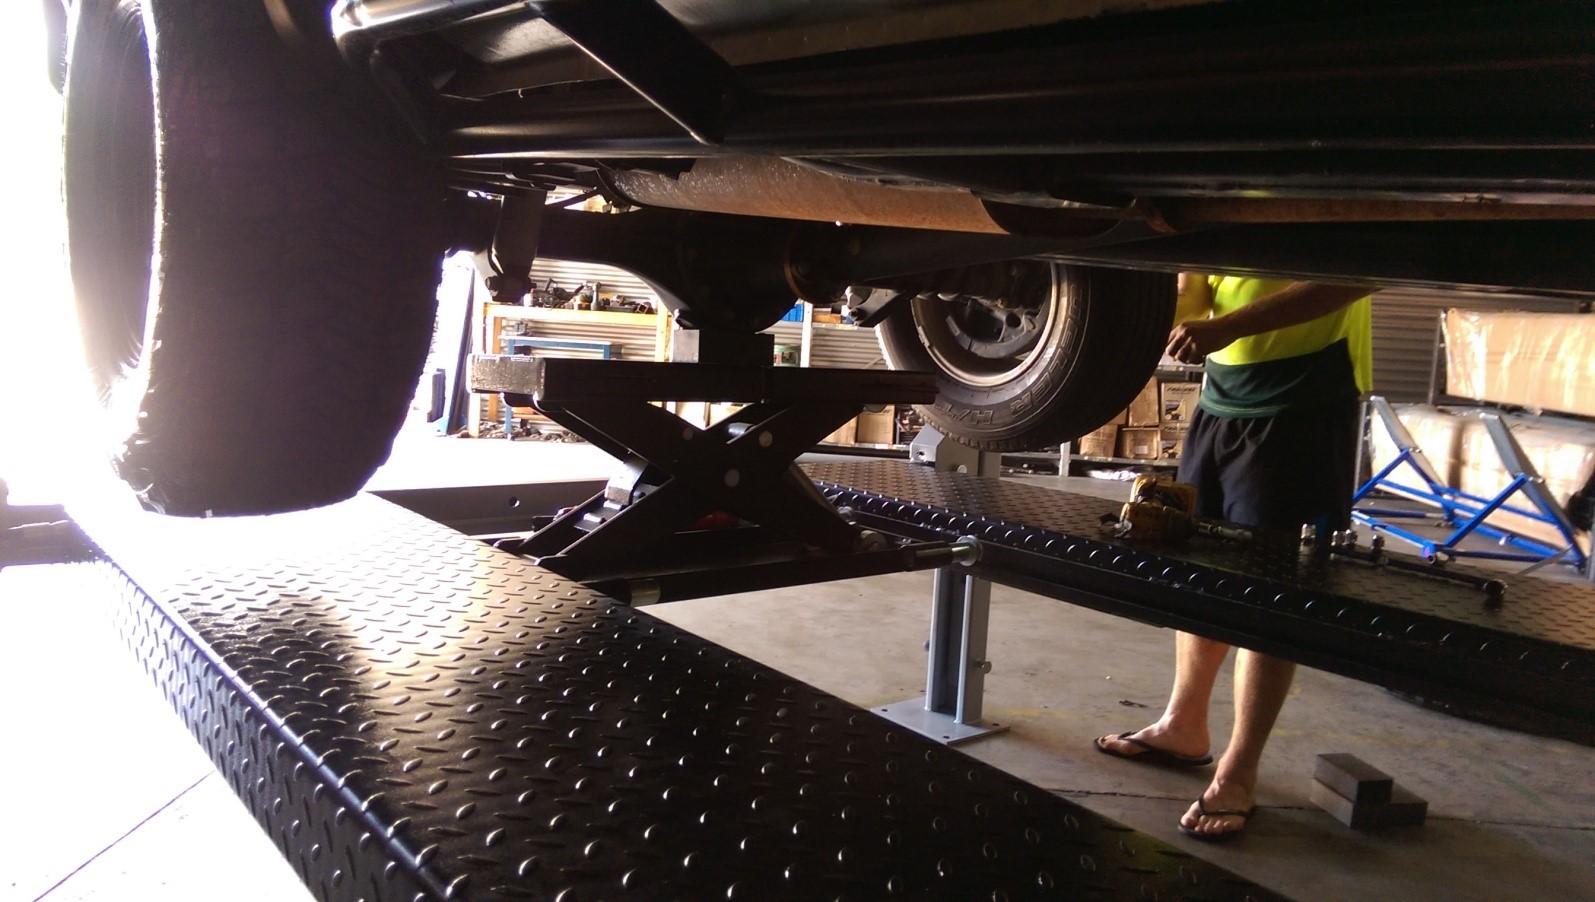 Lift King 9 4-Post Auto Hoist Image 03